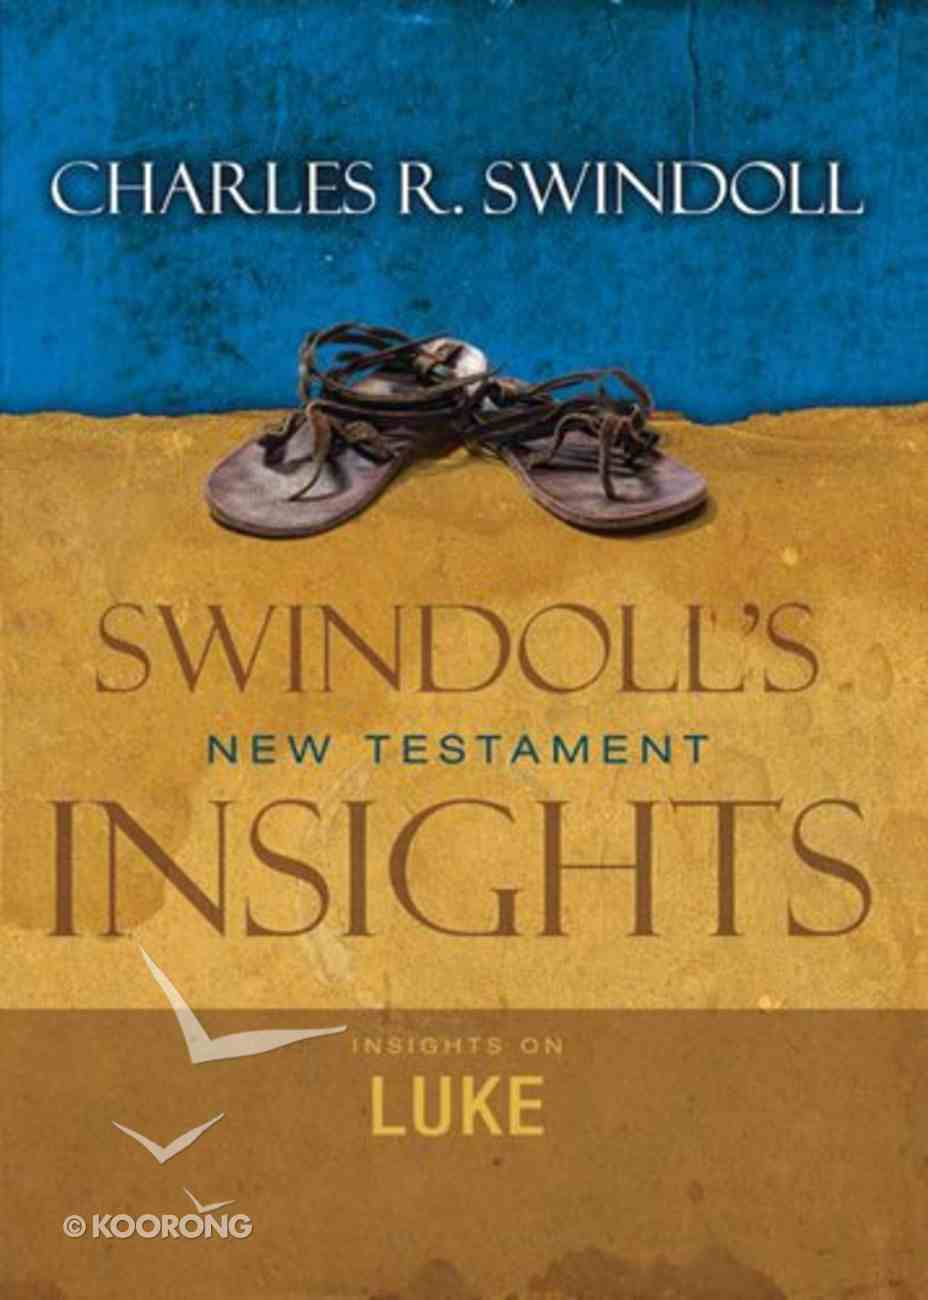 Slintc: Insights on Luke (Swindoll's New Testment Insights Series) eBook